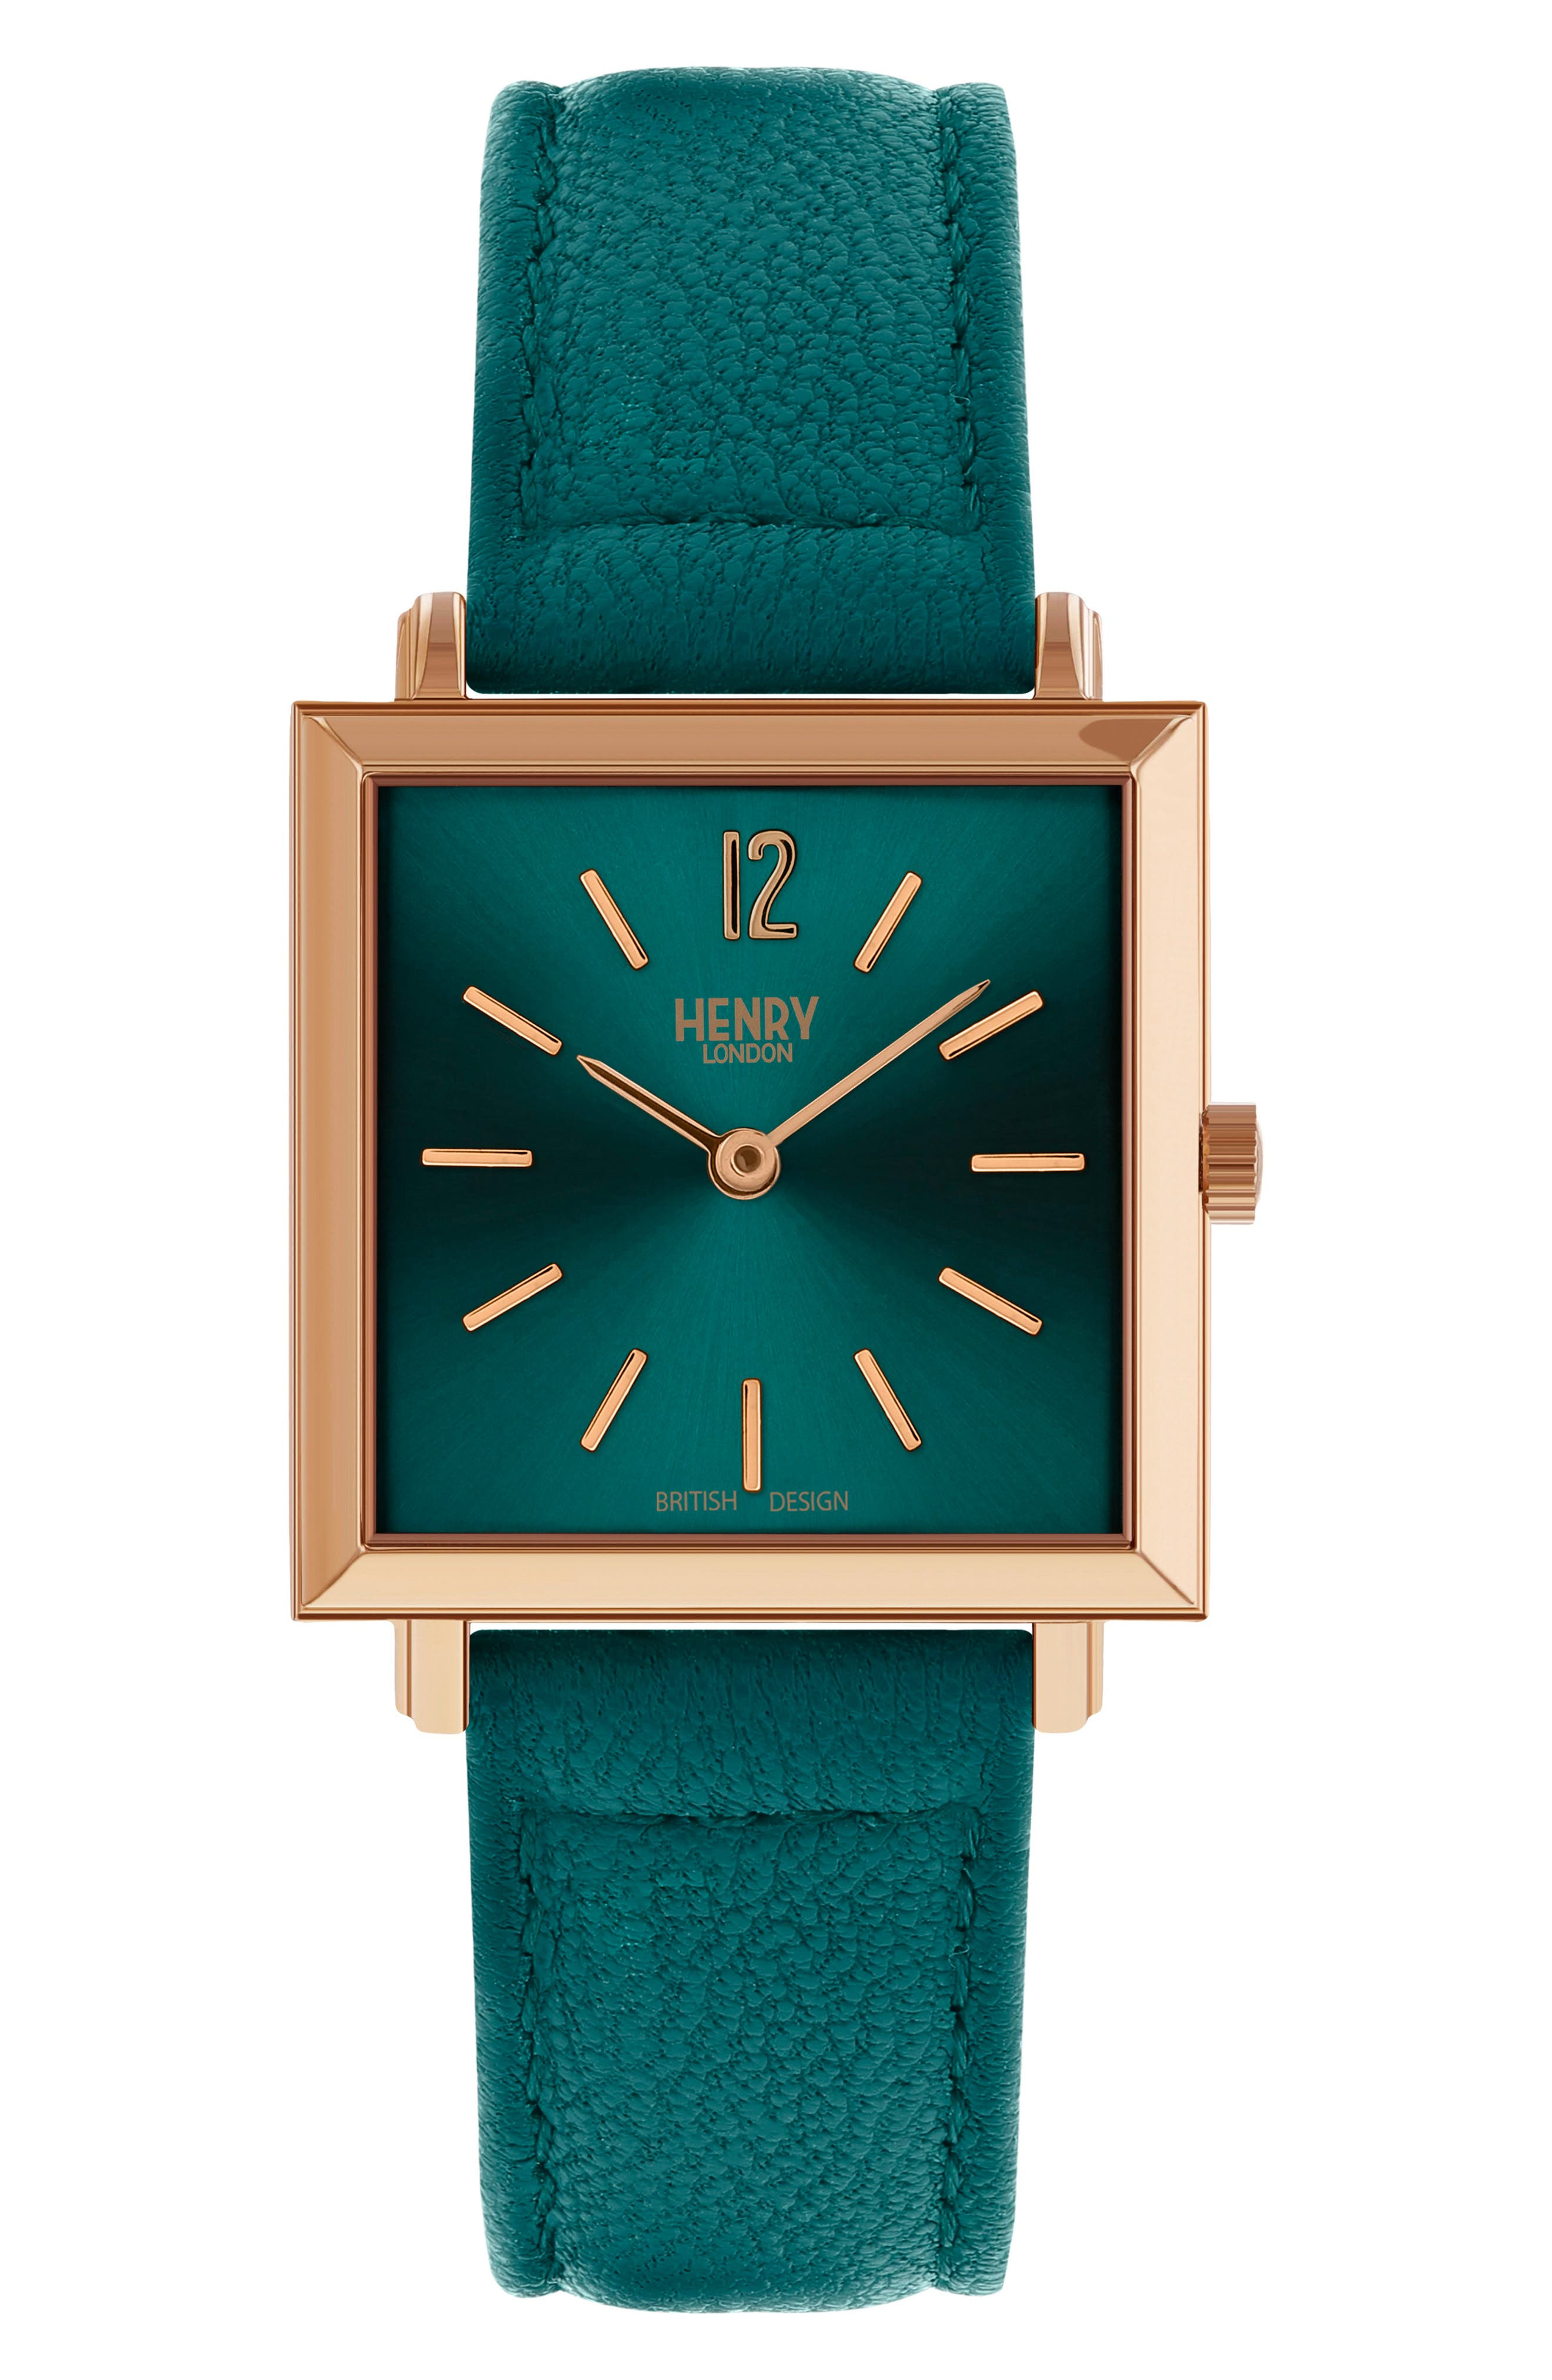 HENRY LONDON Heritage Leather Strap Watch, 26Mm in Mallard/ Rose Gold